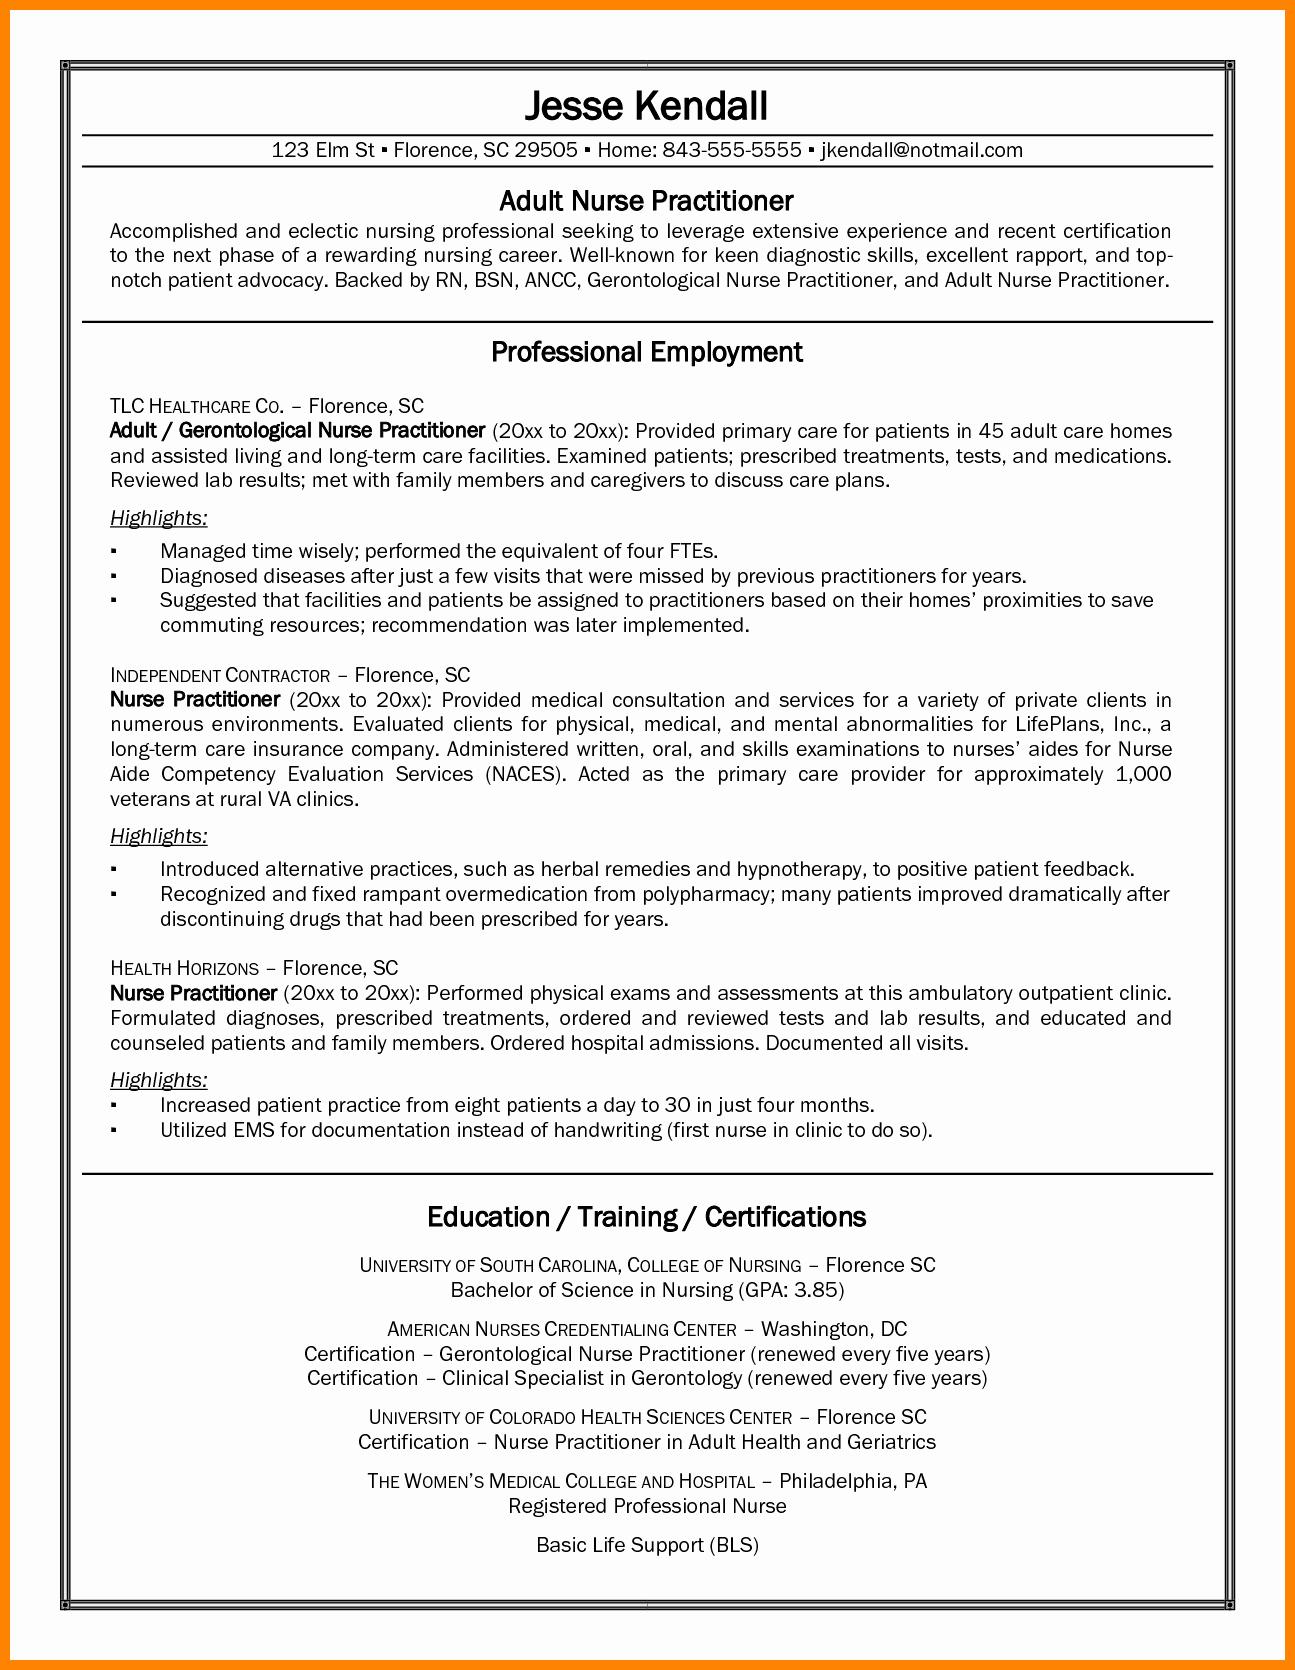 Curriculum Vitae Nursing Template Fresh 9 Cv Nurse Practitioner